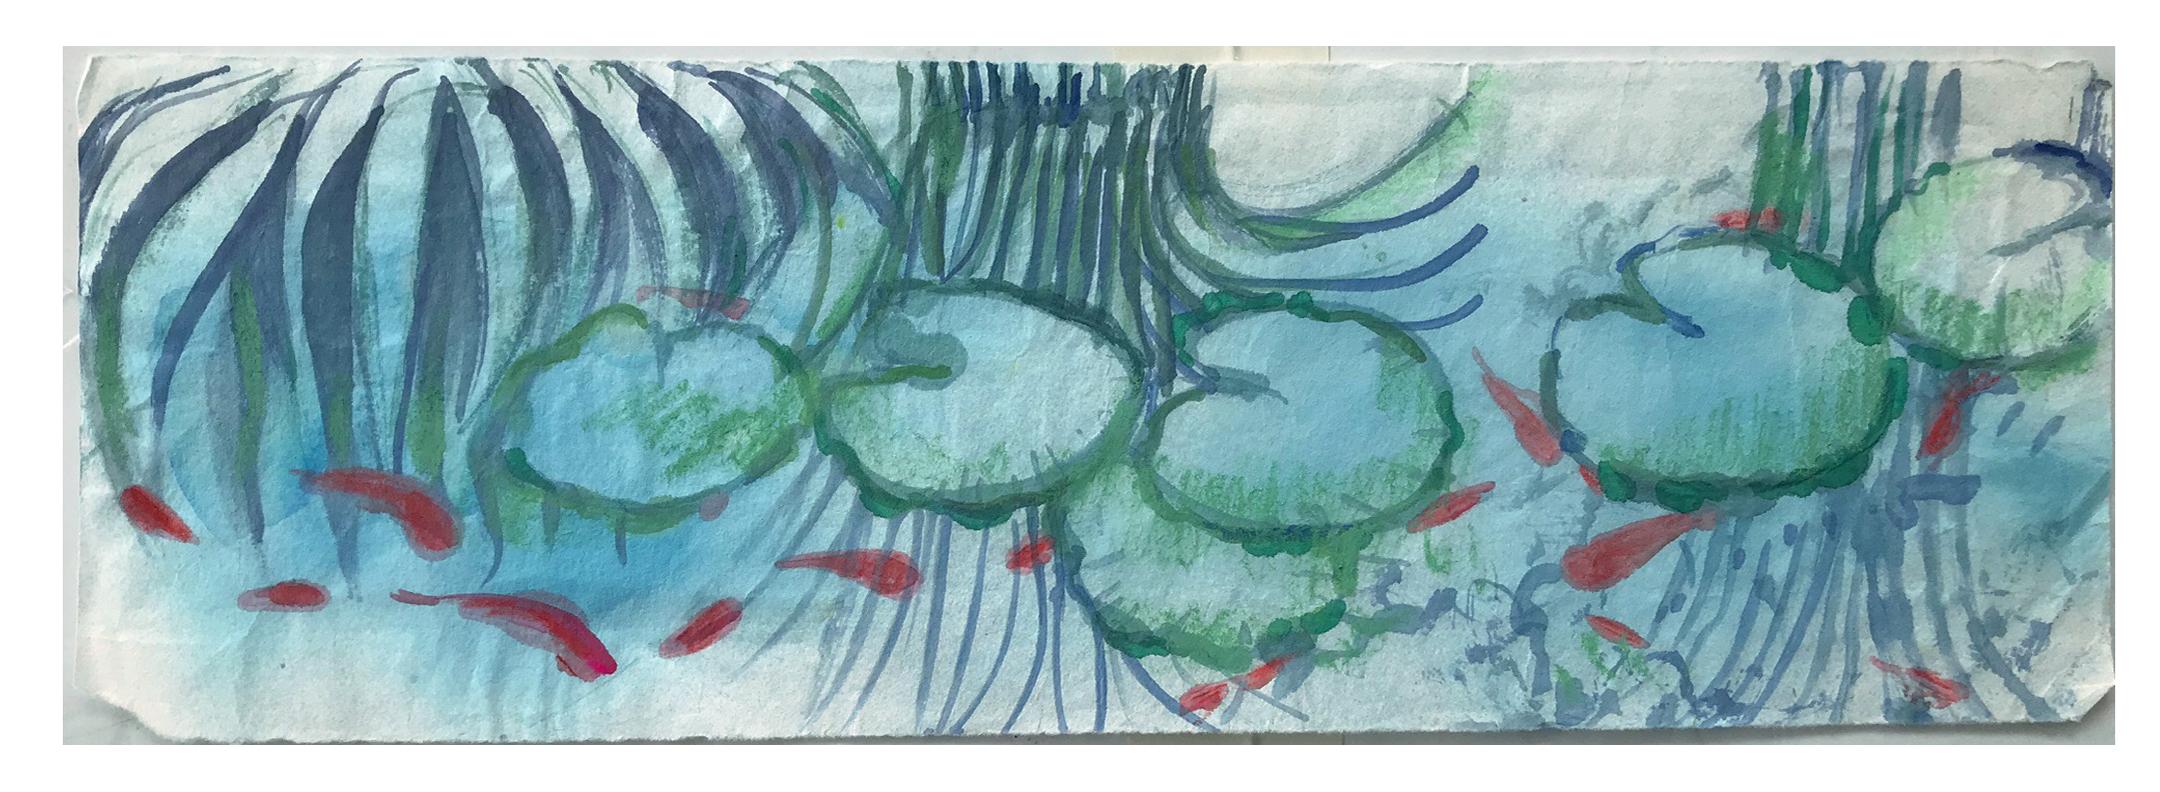 Pond and Koi Sketch